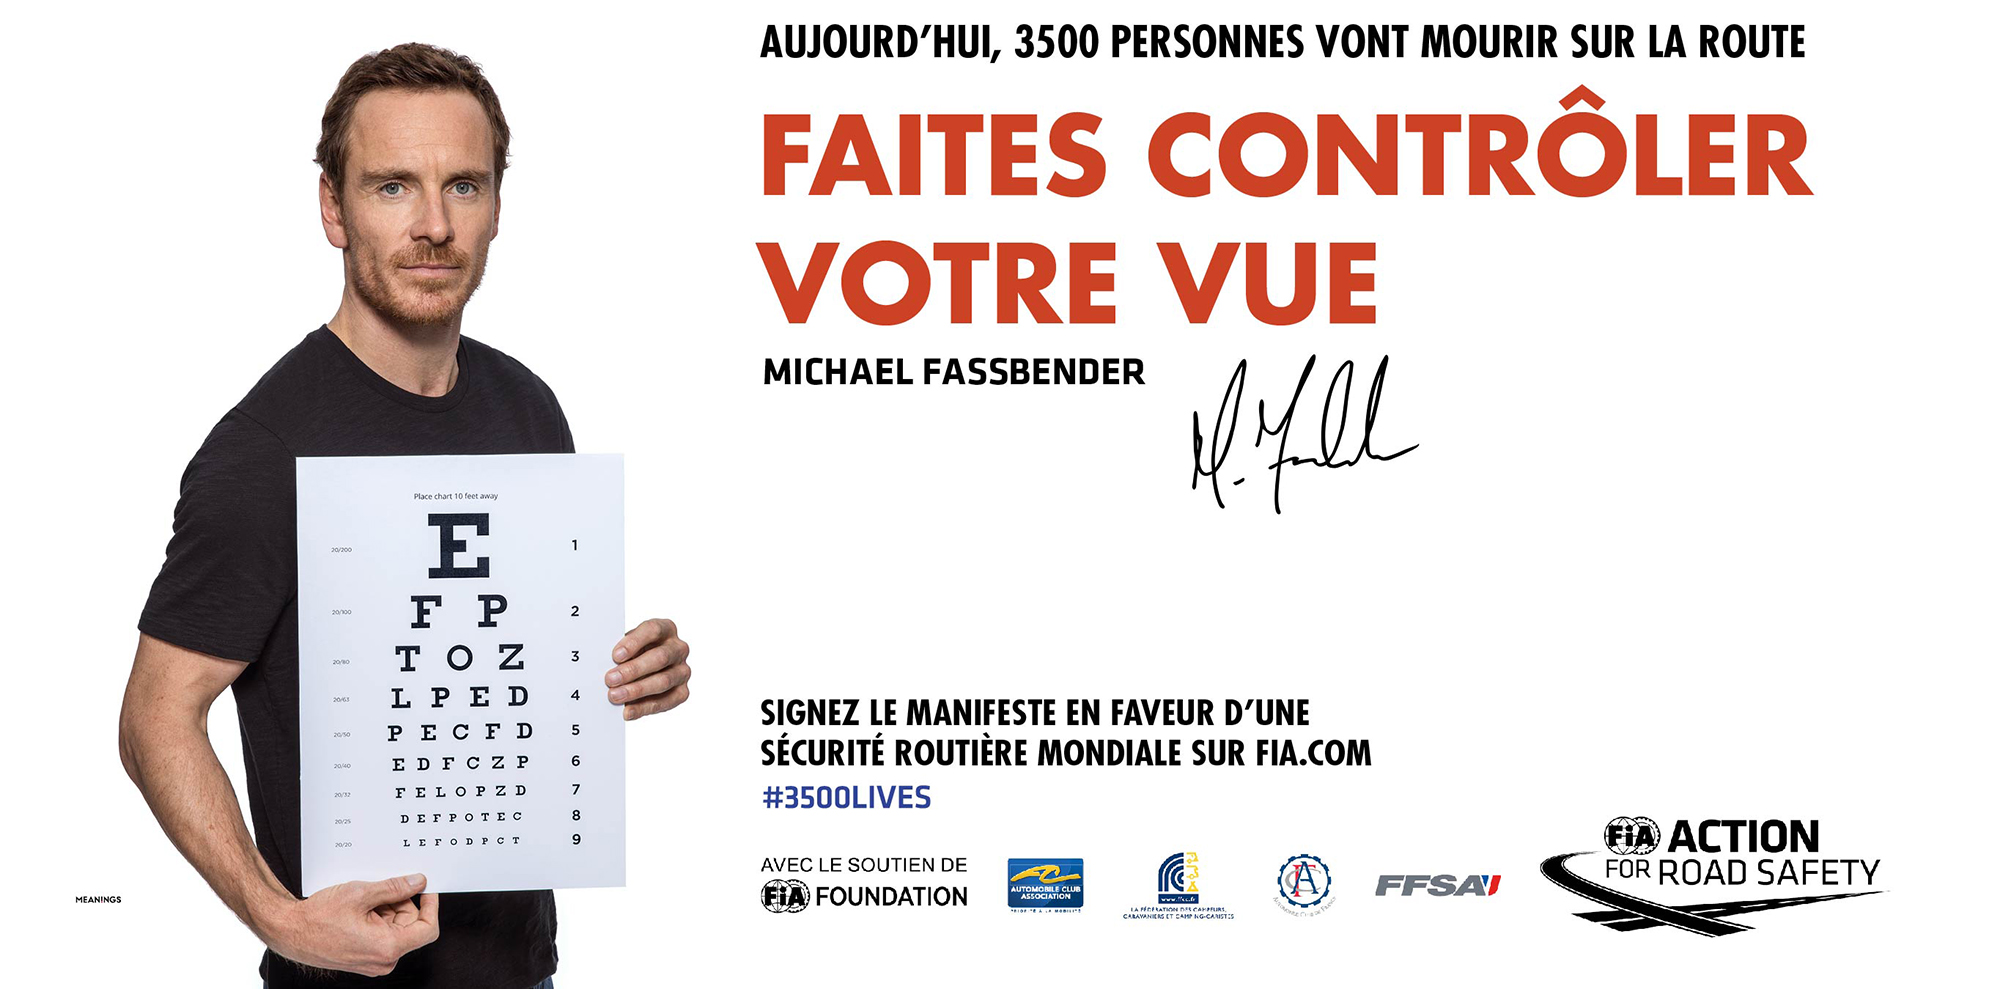 FIA Campagne MichaelFassbender